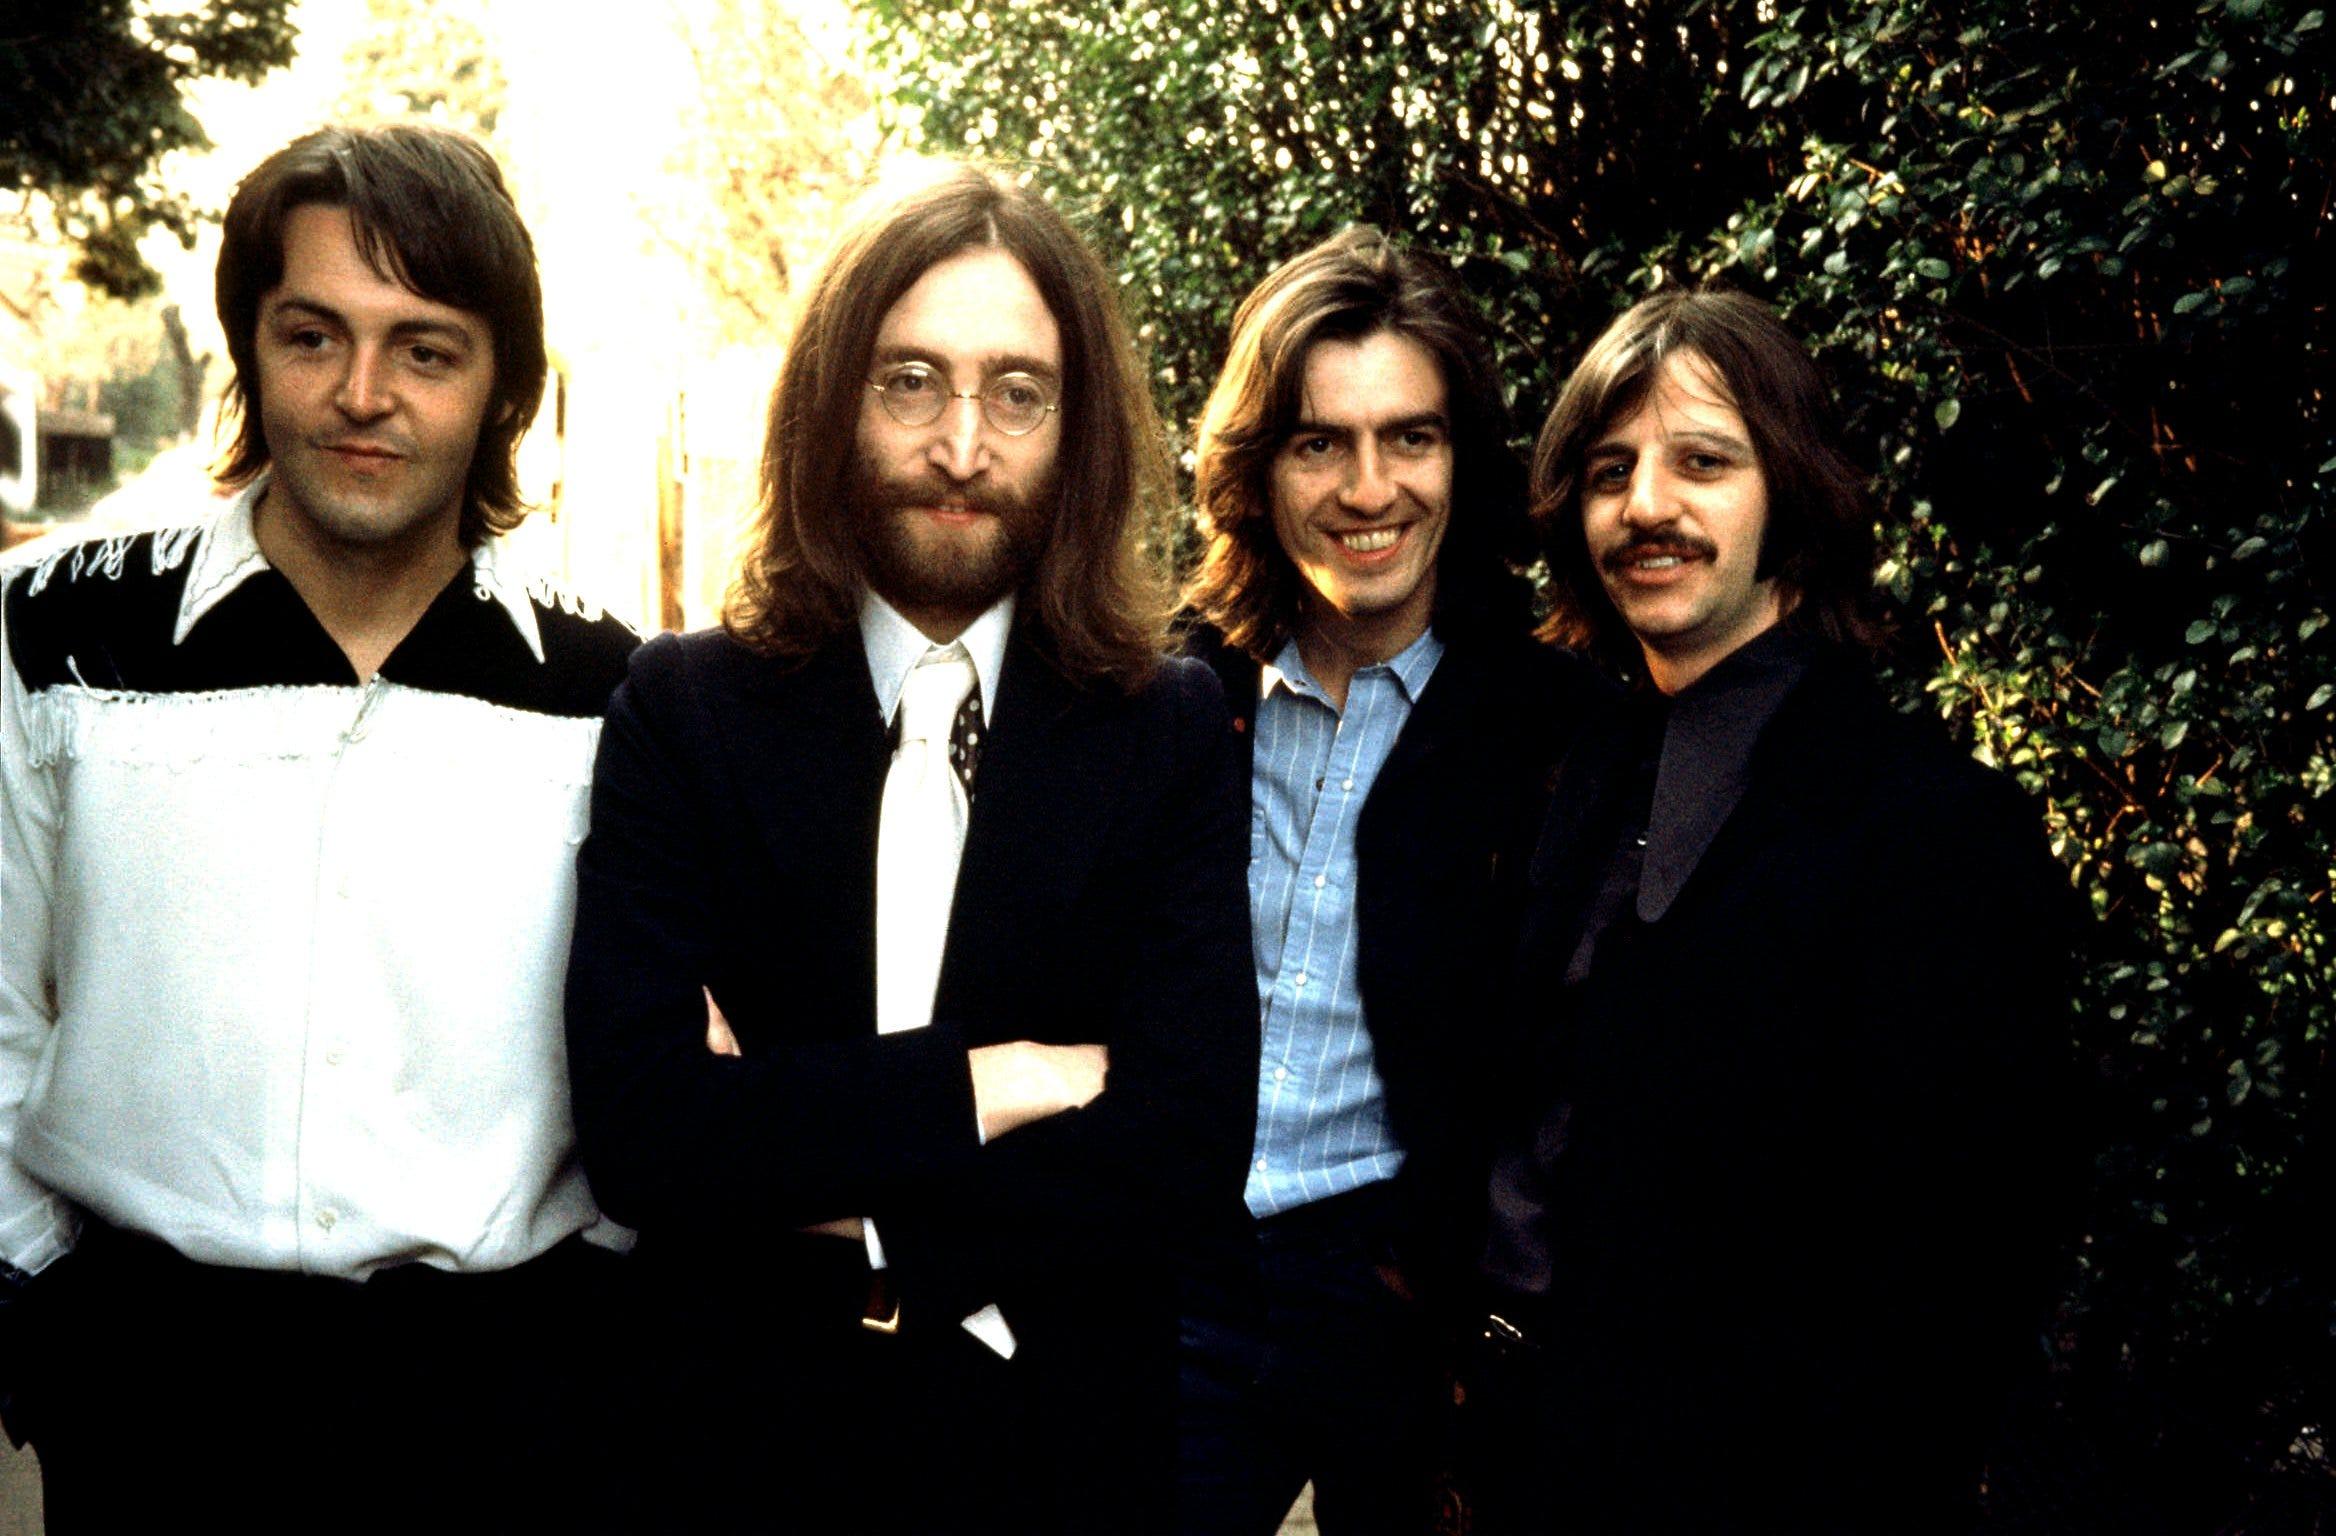 SATB Let it Be John Lennon and Paul McCartney